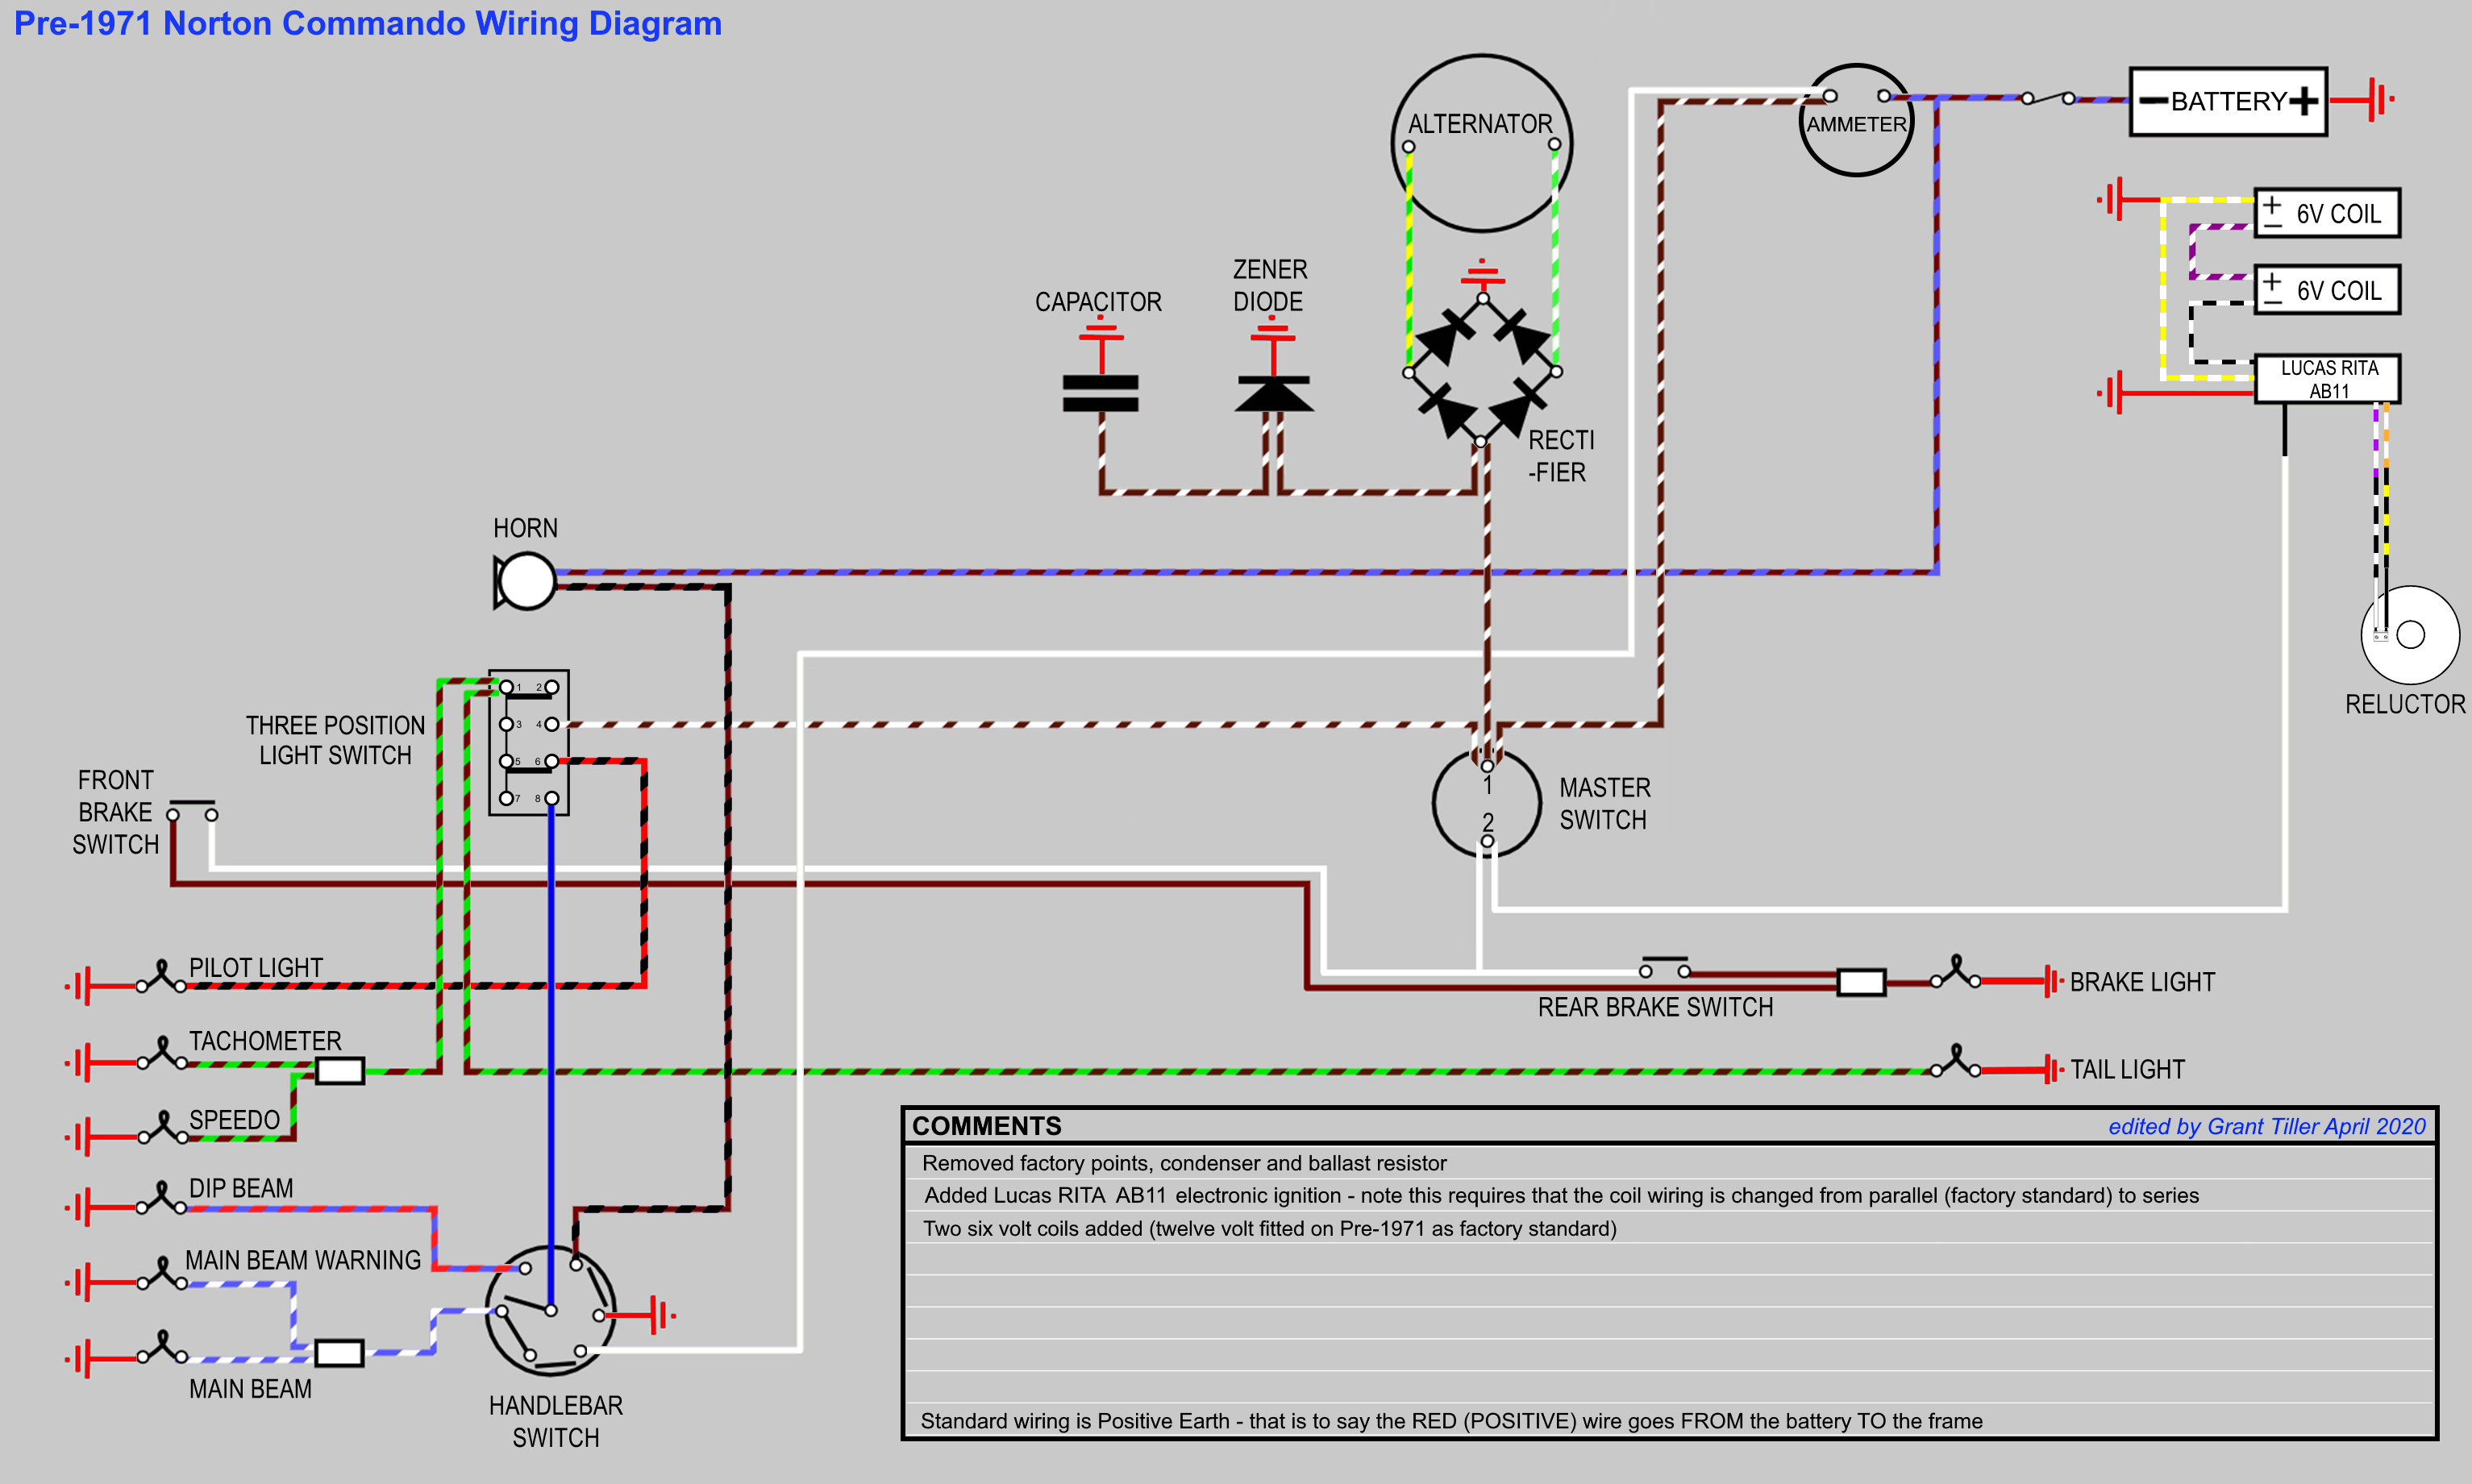 Lucas A127 Alternator Wiring Diagram 1974 Vw Wiring Diagrams Bege Wiring Diagram